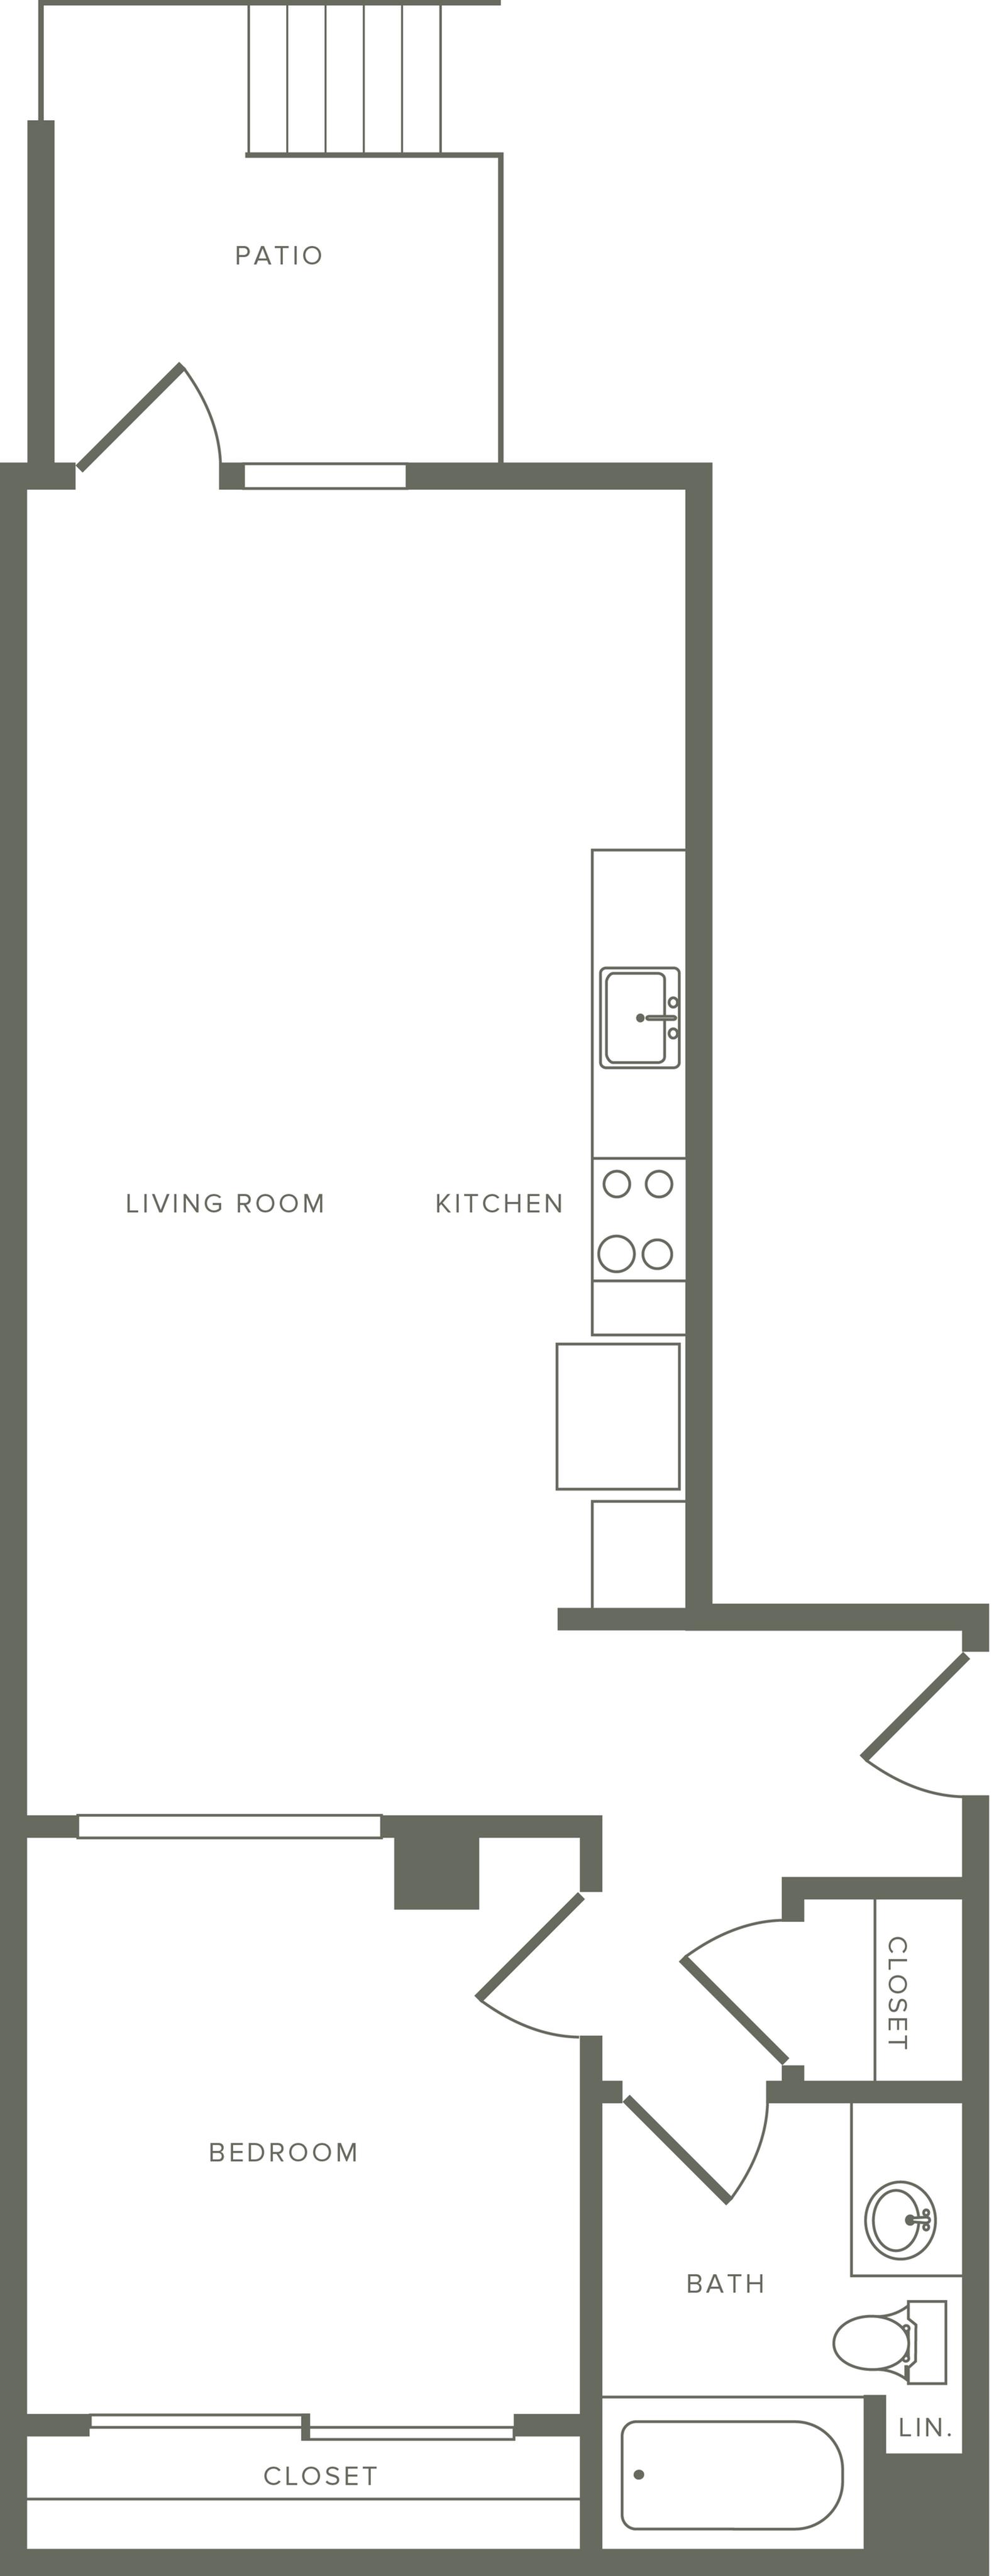 714 square foot one bedroom one bath floor plan image